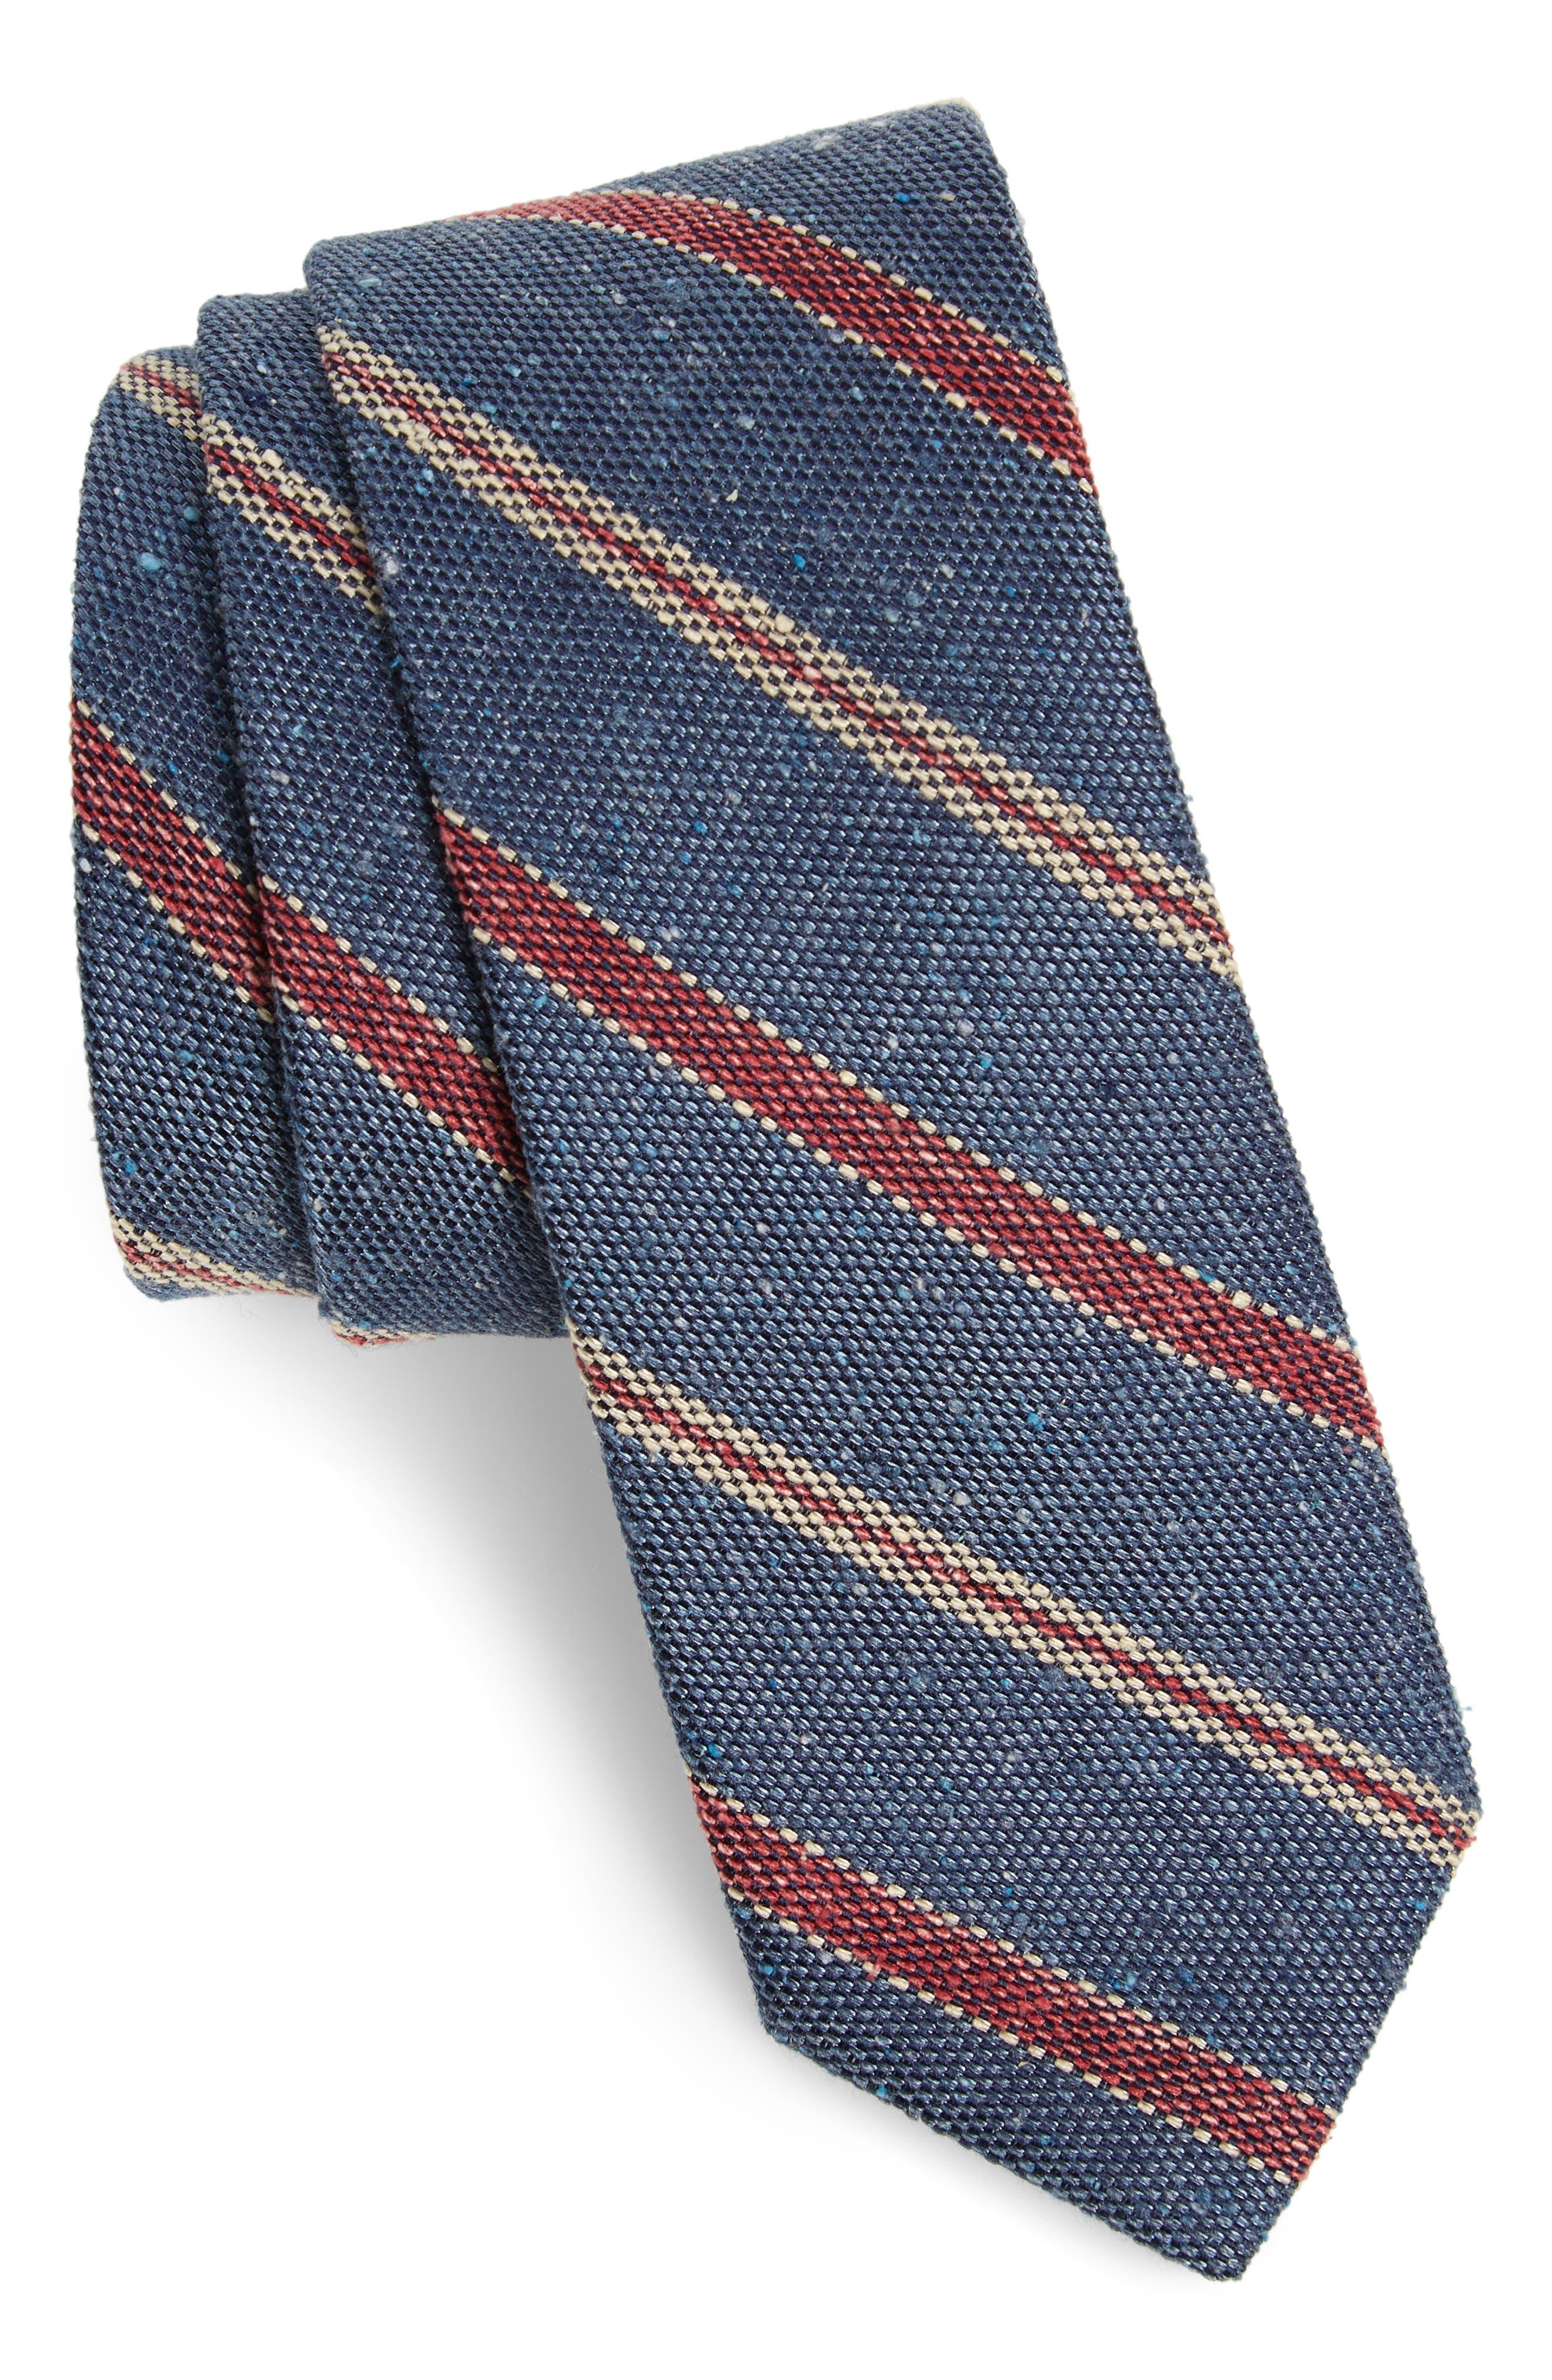 1920s Bow Ties | Gatsby Tie,  Art Deco Tie Mens The Tie Bar Cargo Stripe Silk Tie Size Regular - Blue $19.00 AT vintagedancer.com